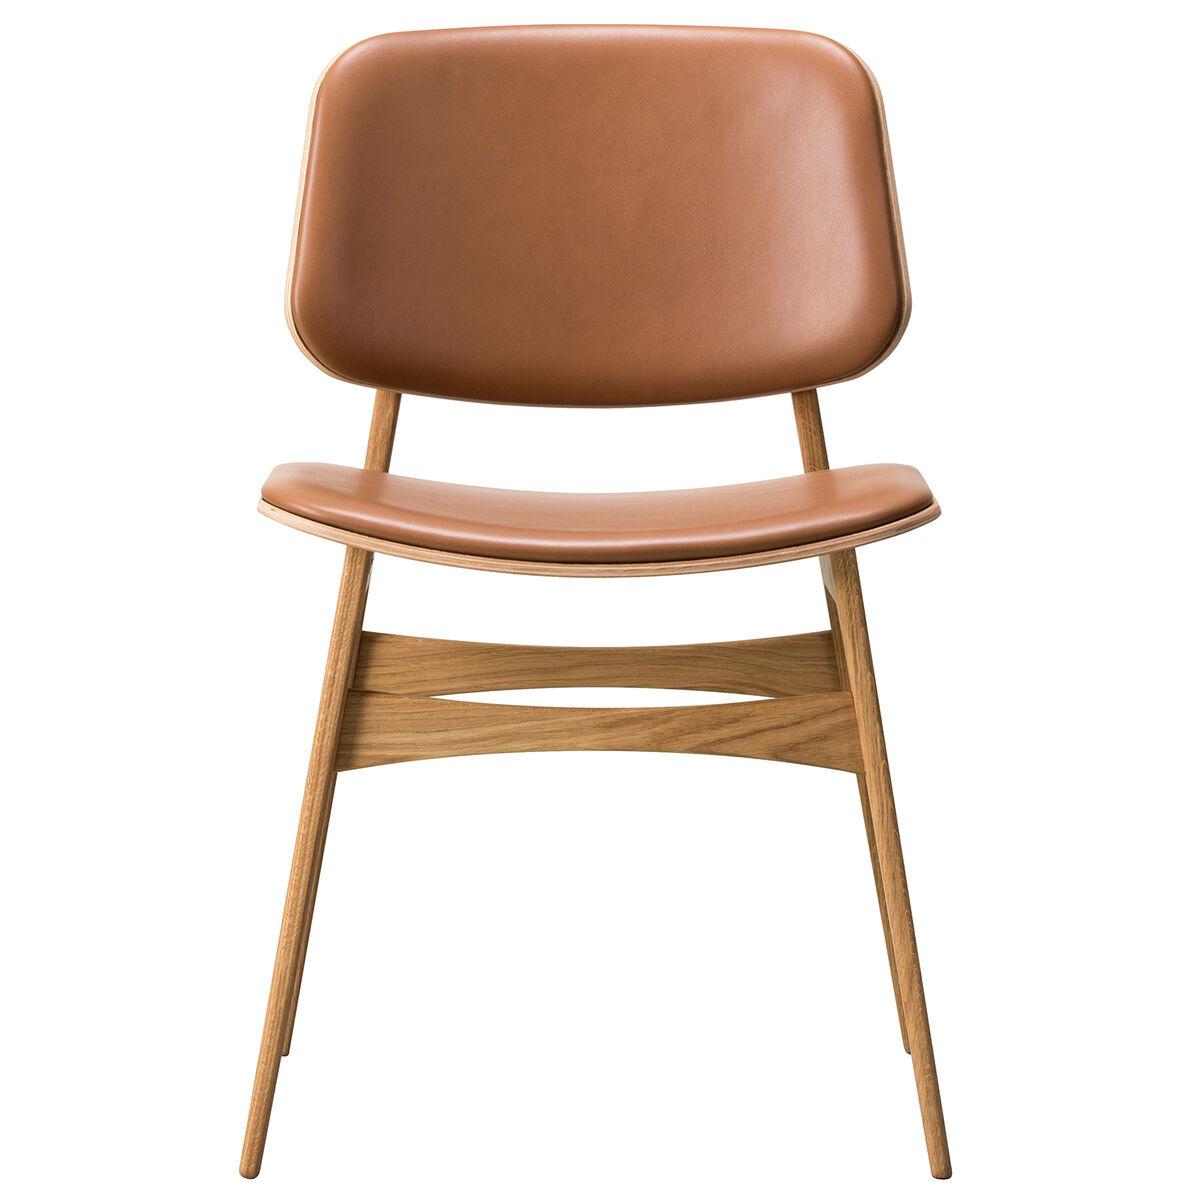 Fredericia S�borg tuoli 3052, puurunko, lakattu tammi - ruskea nahka